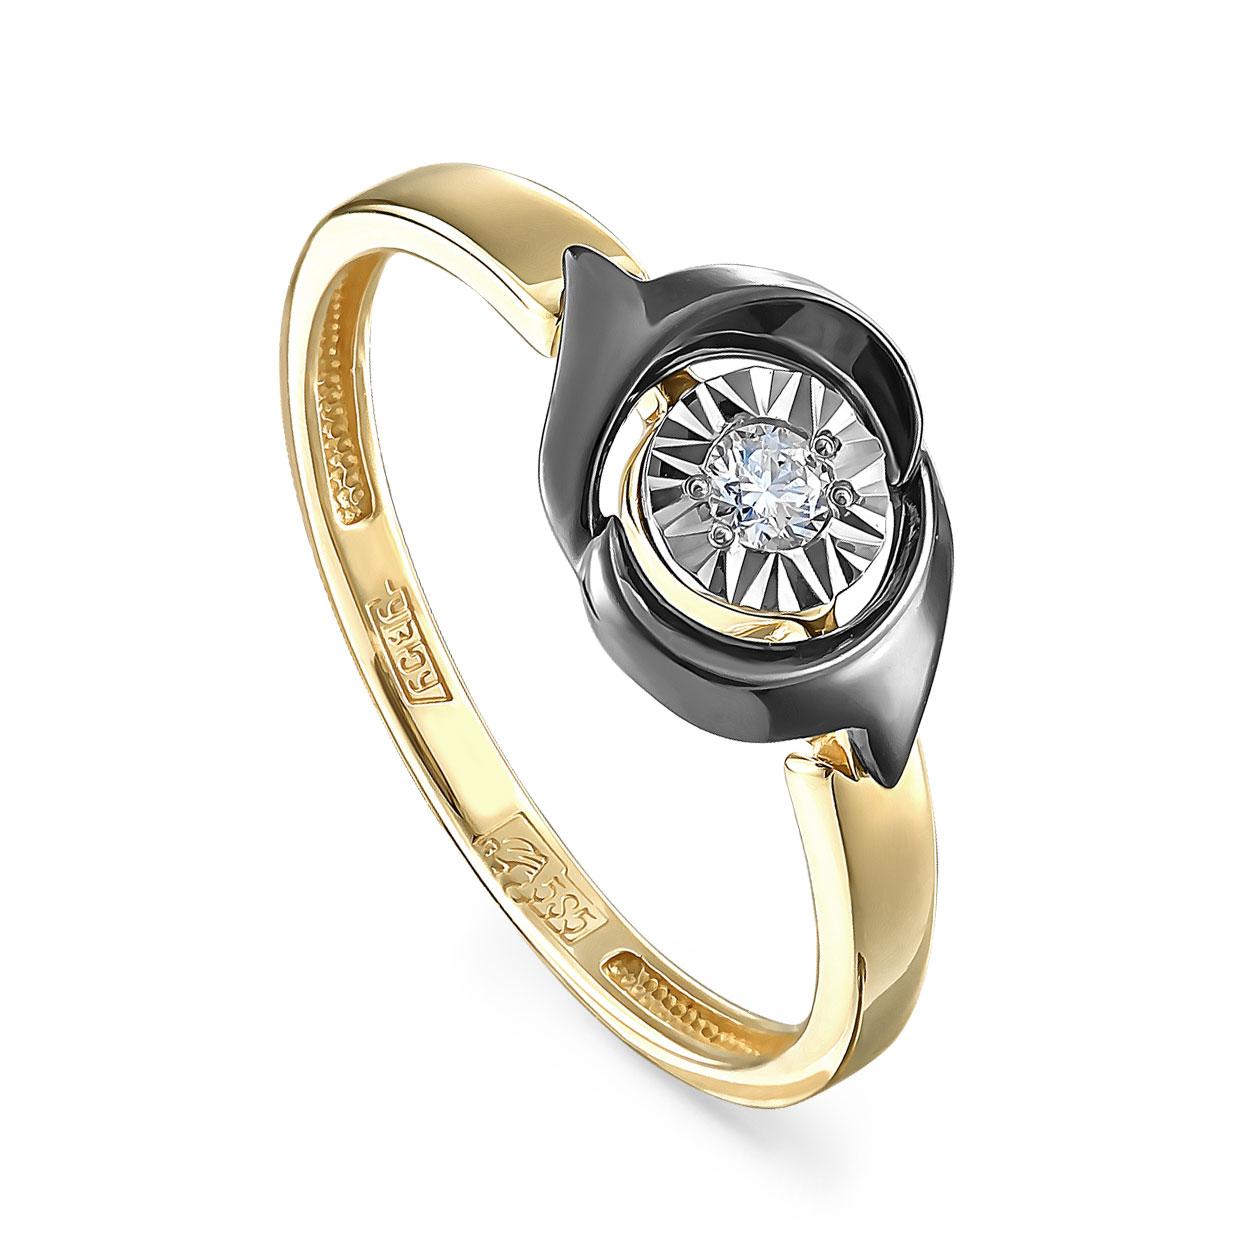 Кольцо из лимонного золота Бриллиант арт. 11-21214-1089 11-21214-1089